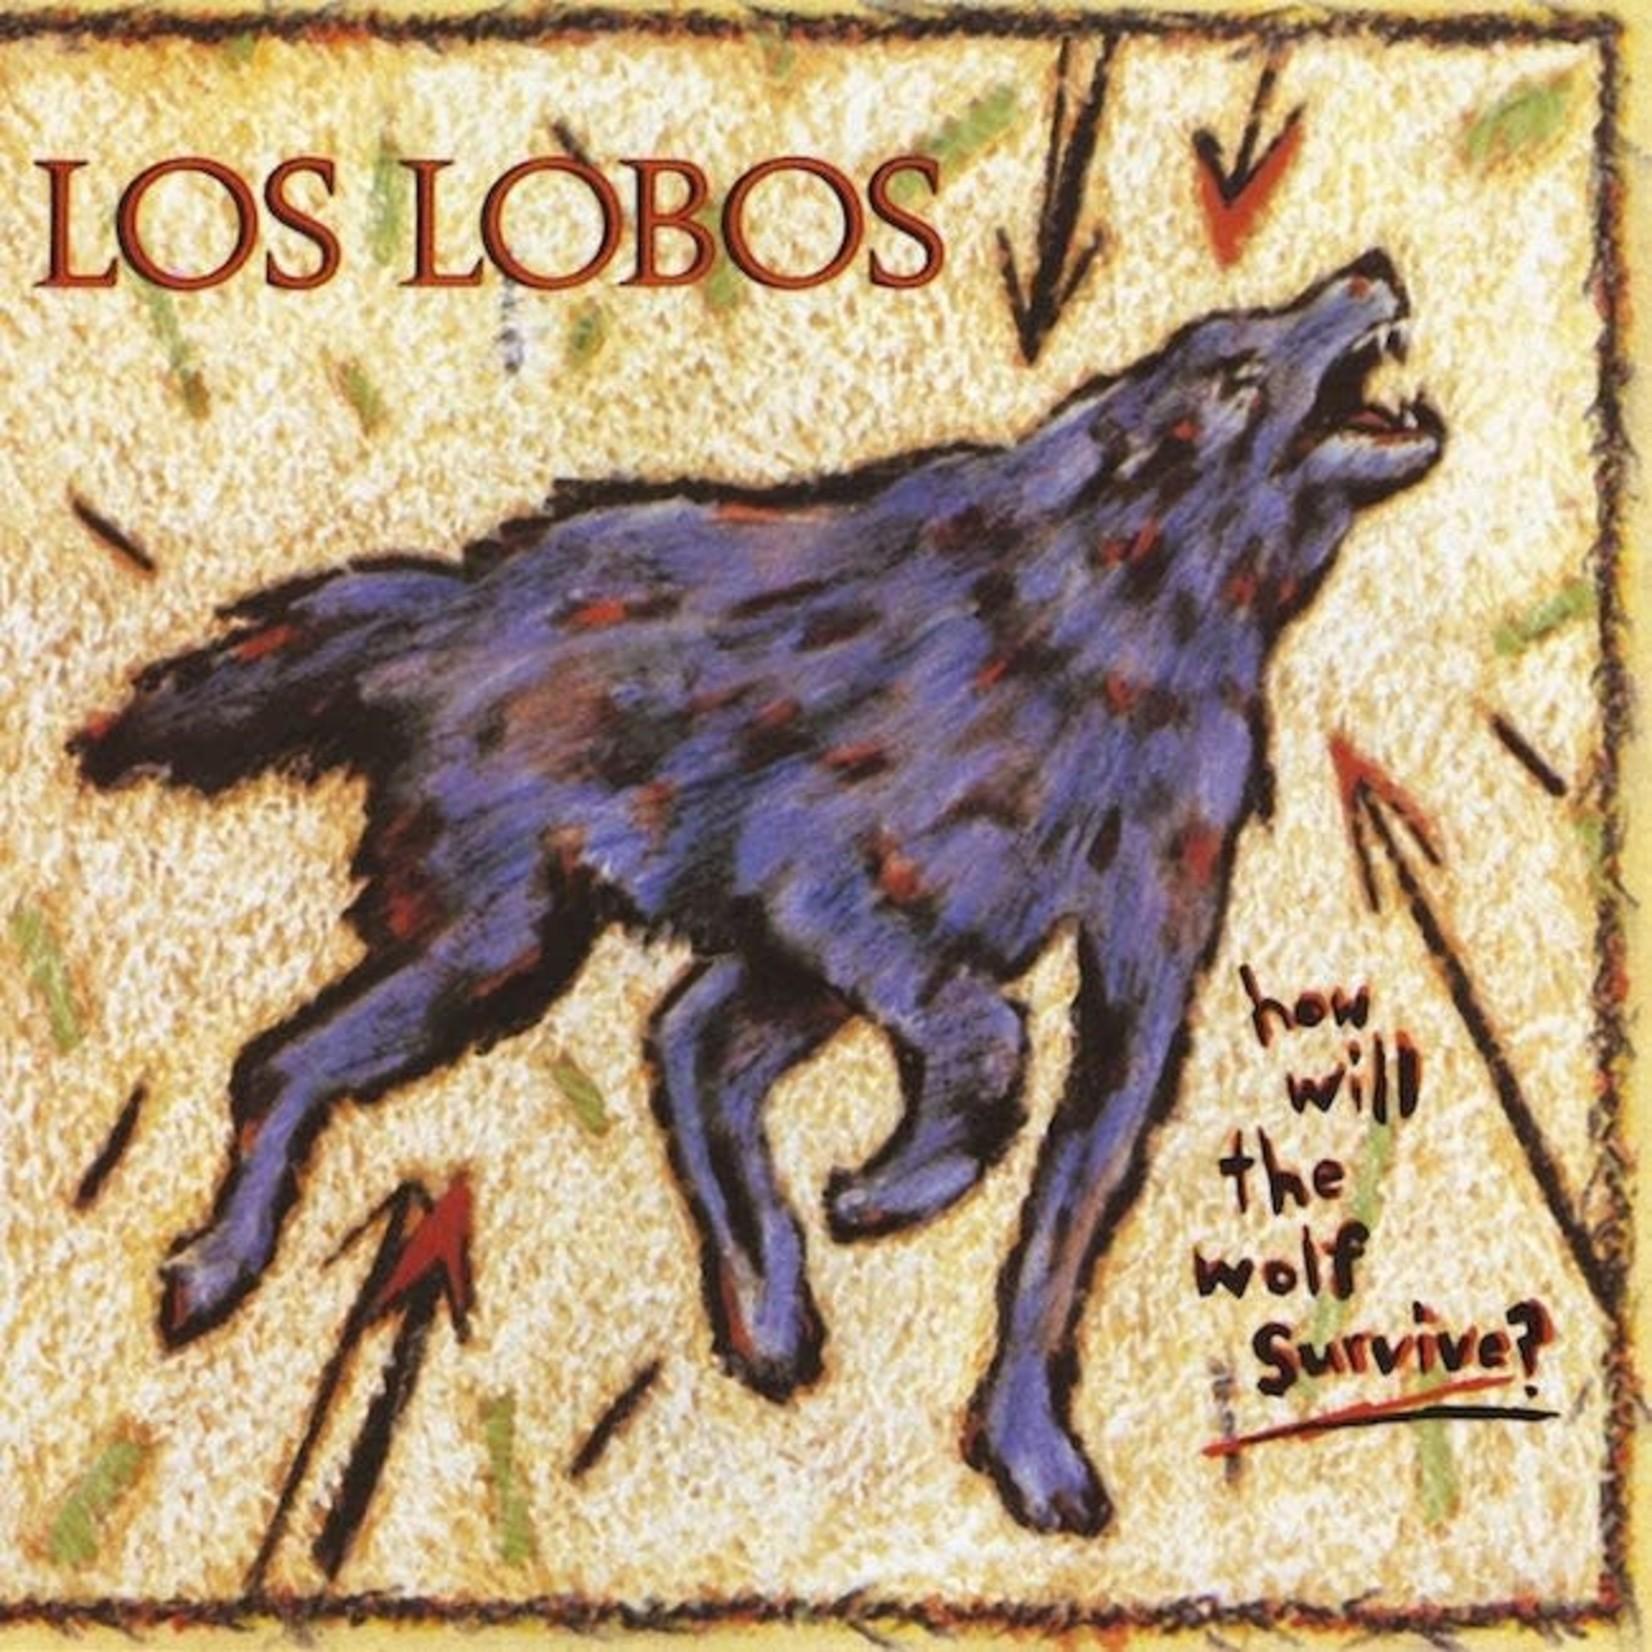 [Vintage] Los Lobos: How Will the Wolf Survive?